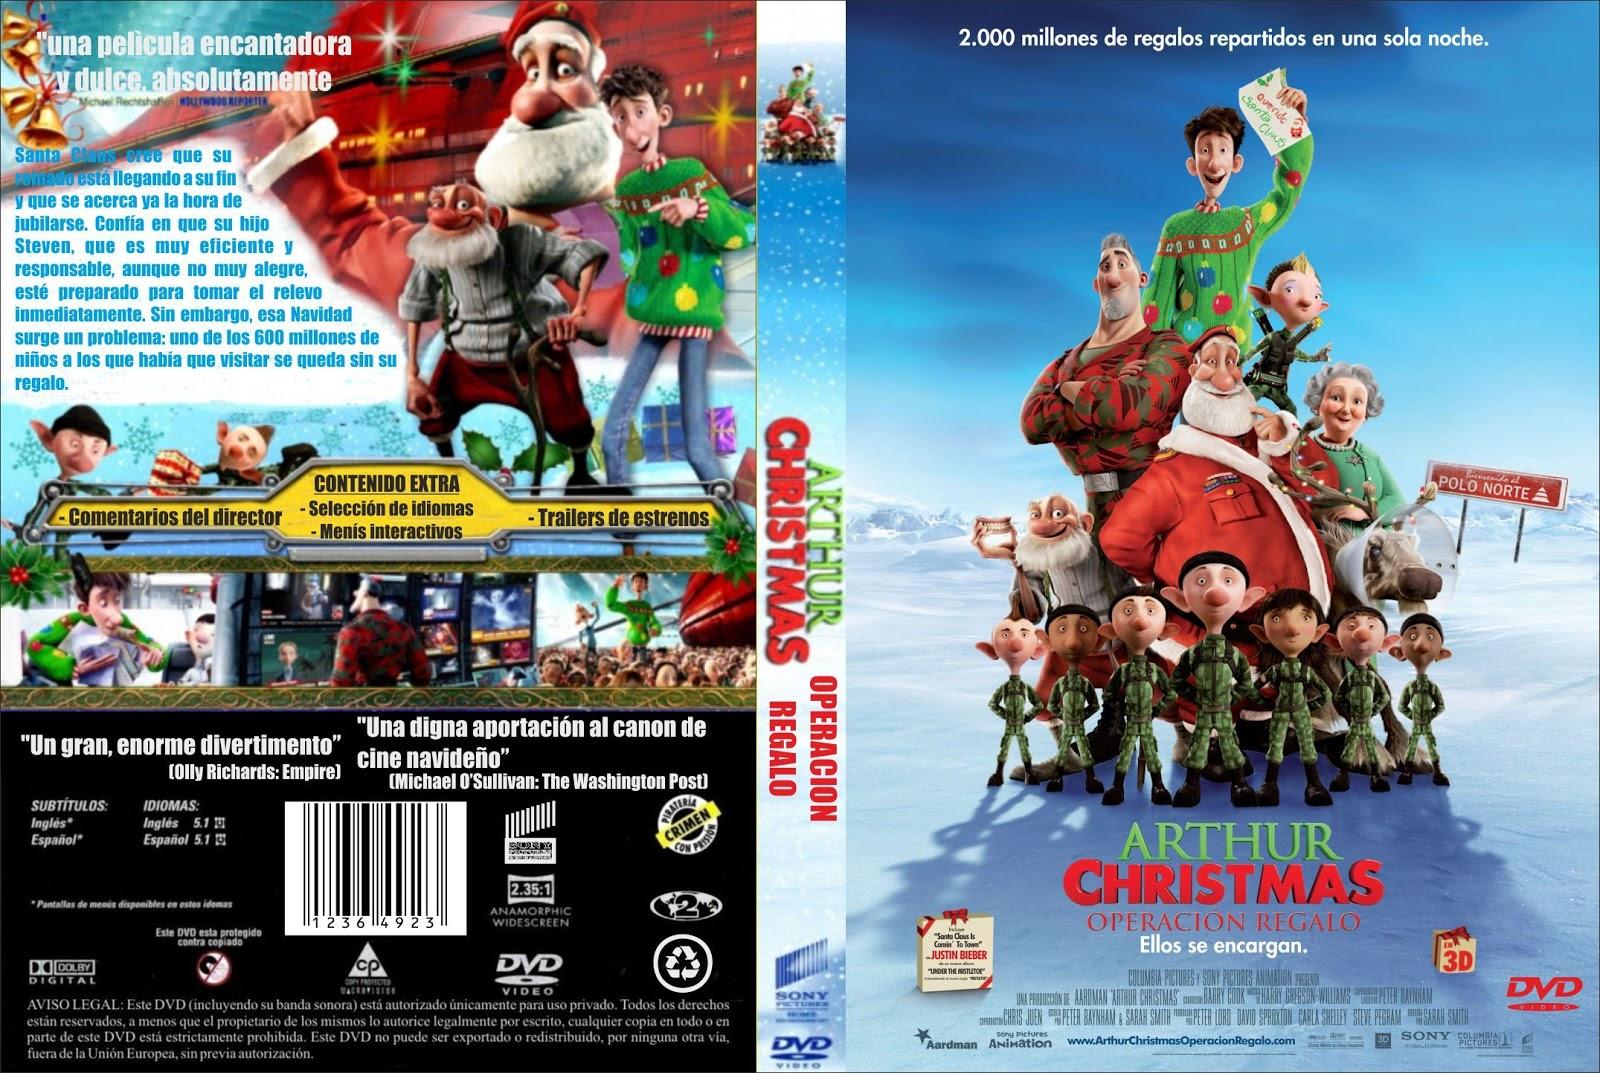 operacion regalo arthur christmas - Arthur Christmas Dvd